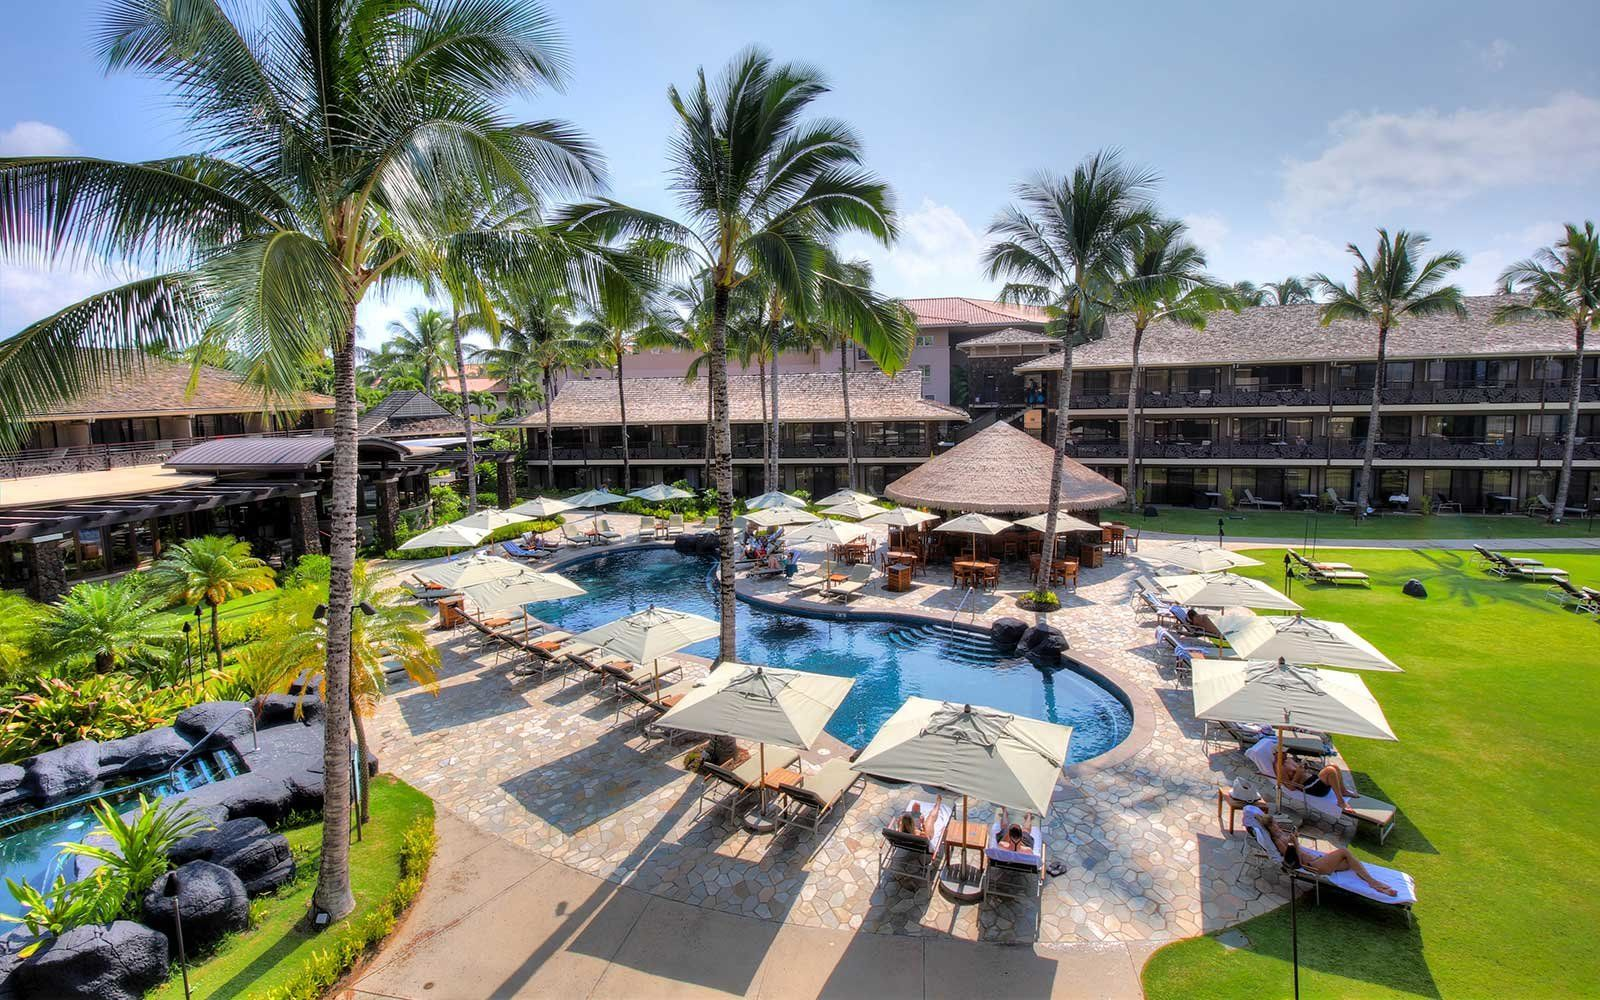 Koa Kea Hotel Resort Kauai